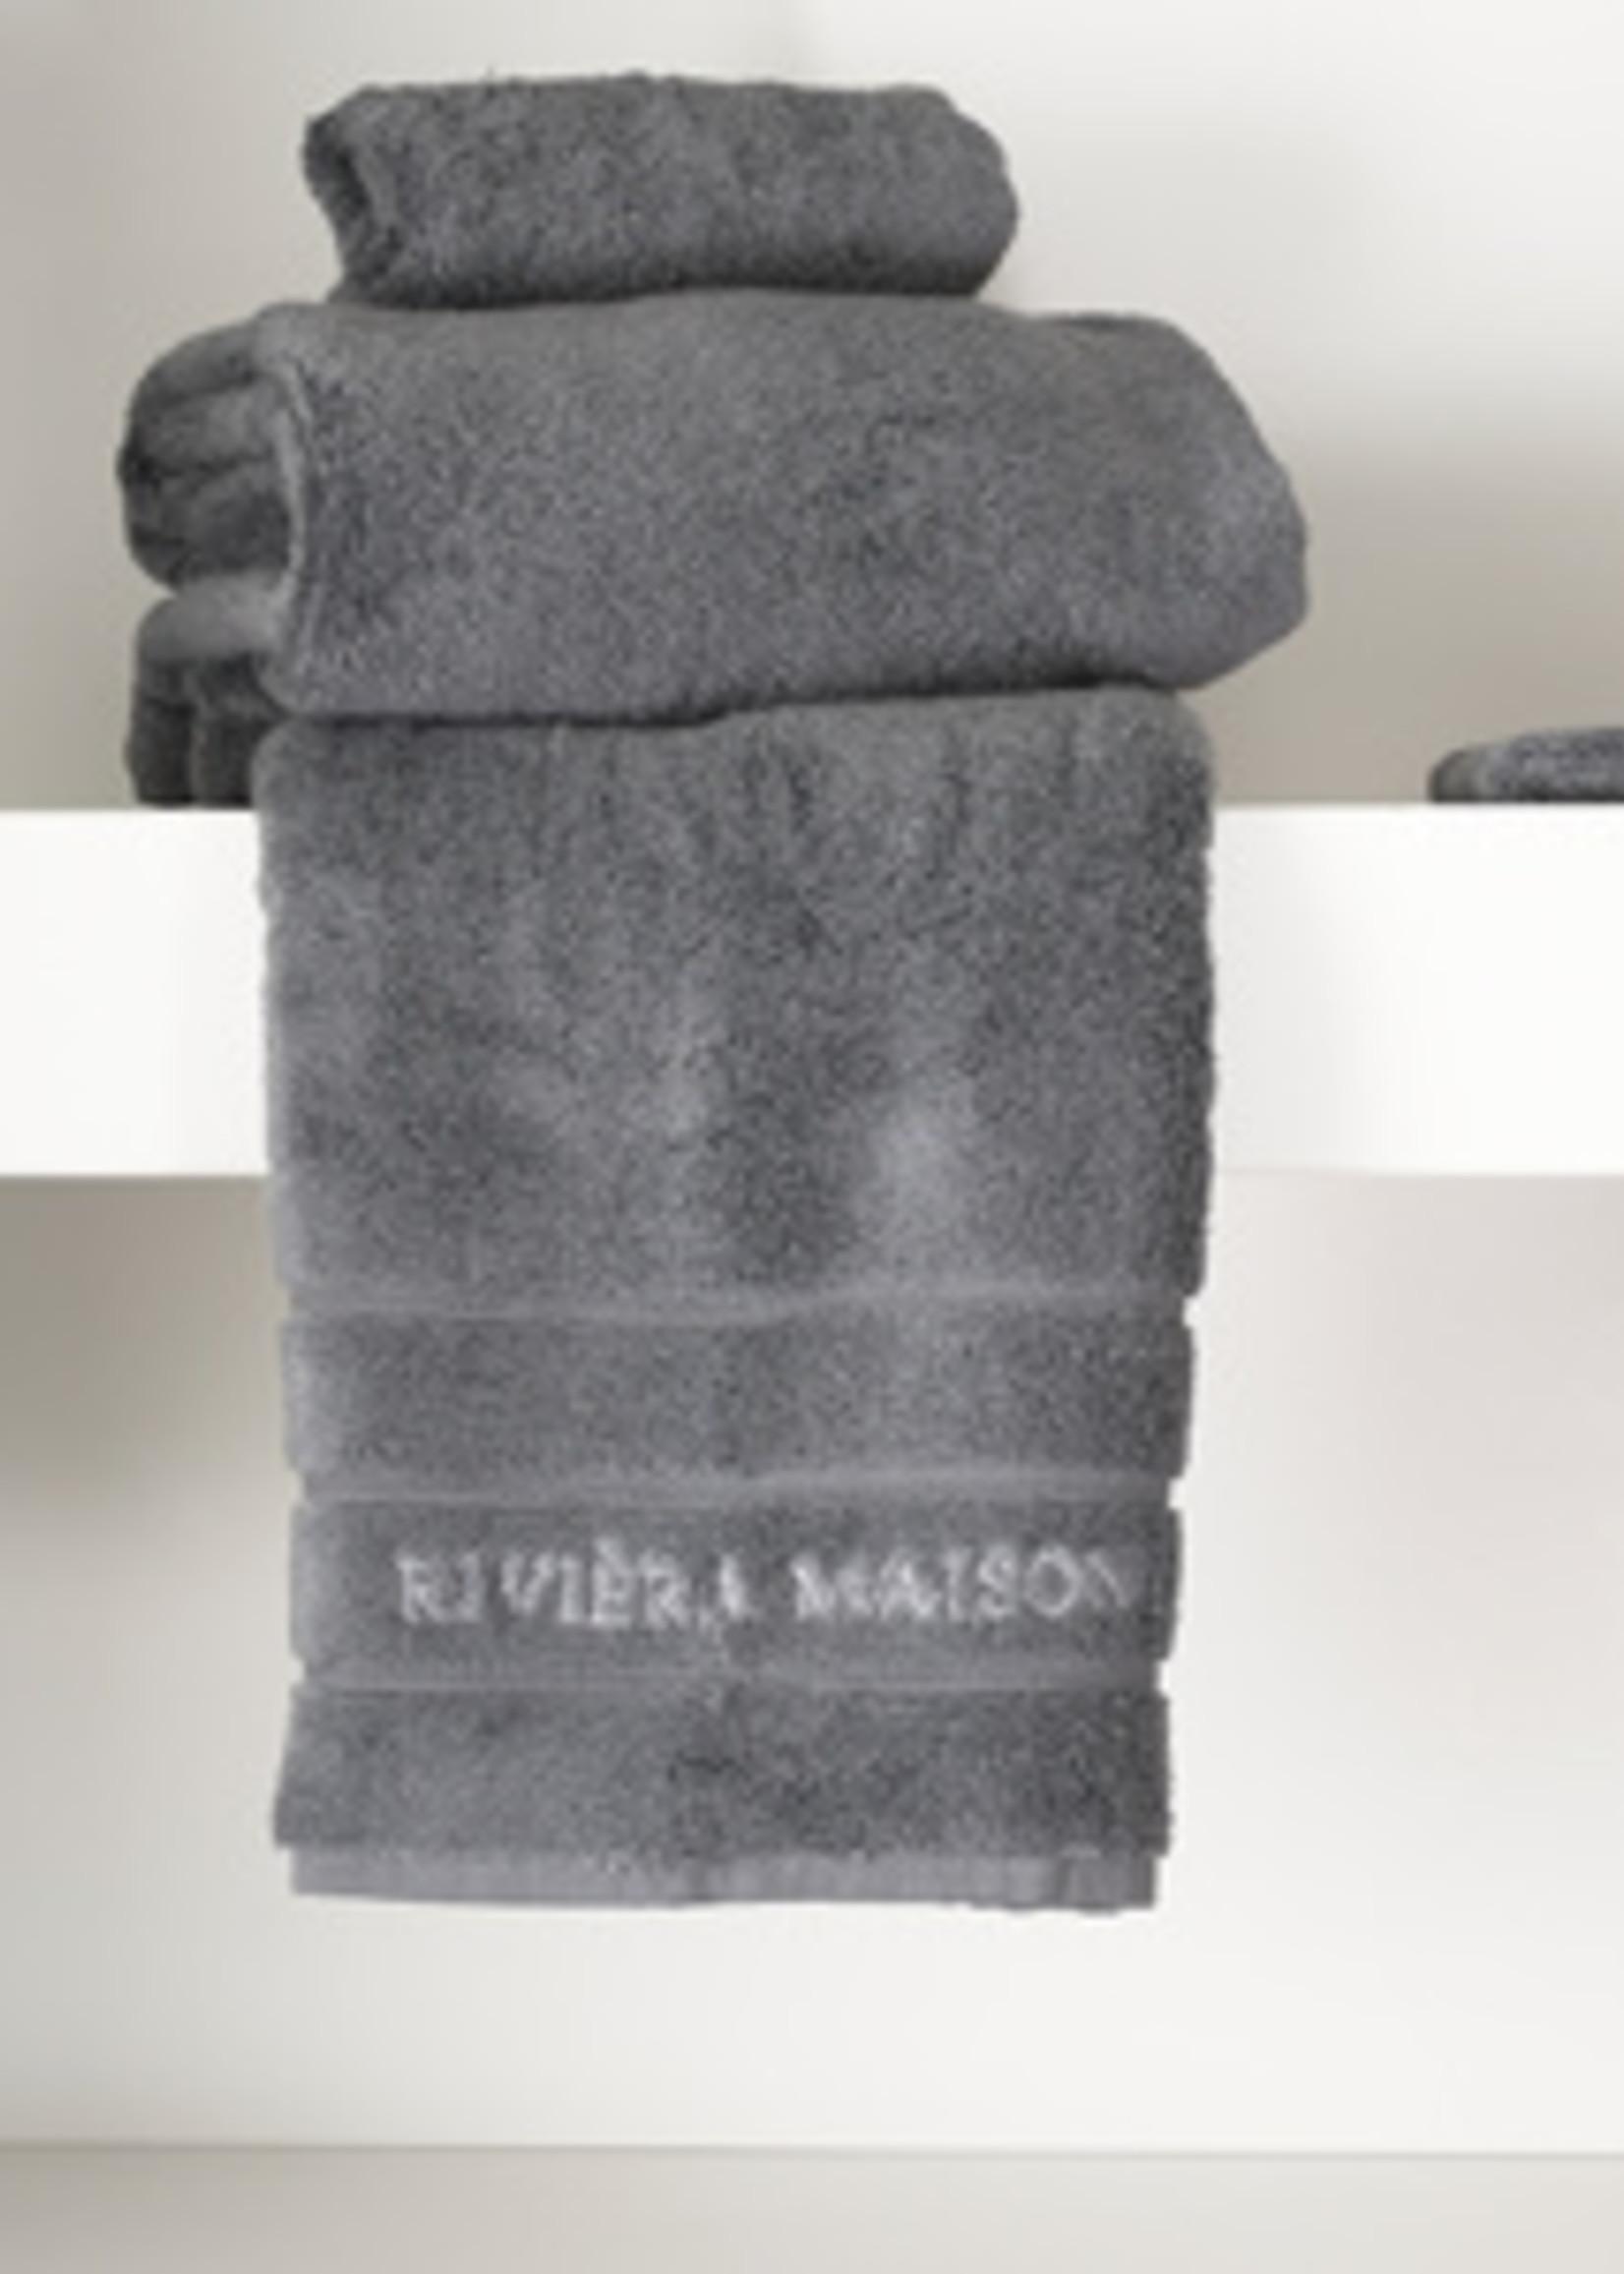 Riviera Maison RM Hotel Towel anthracite 100x50